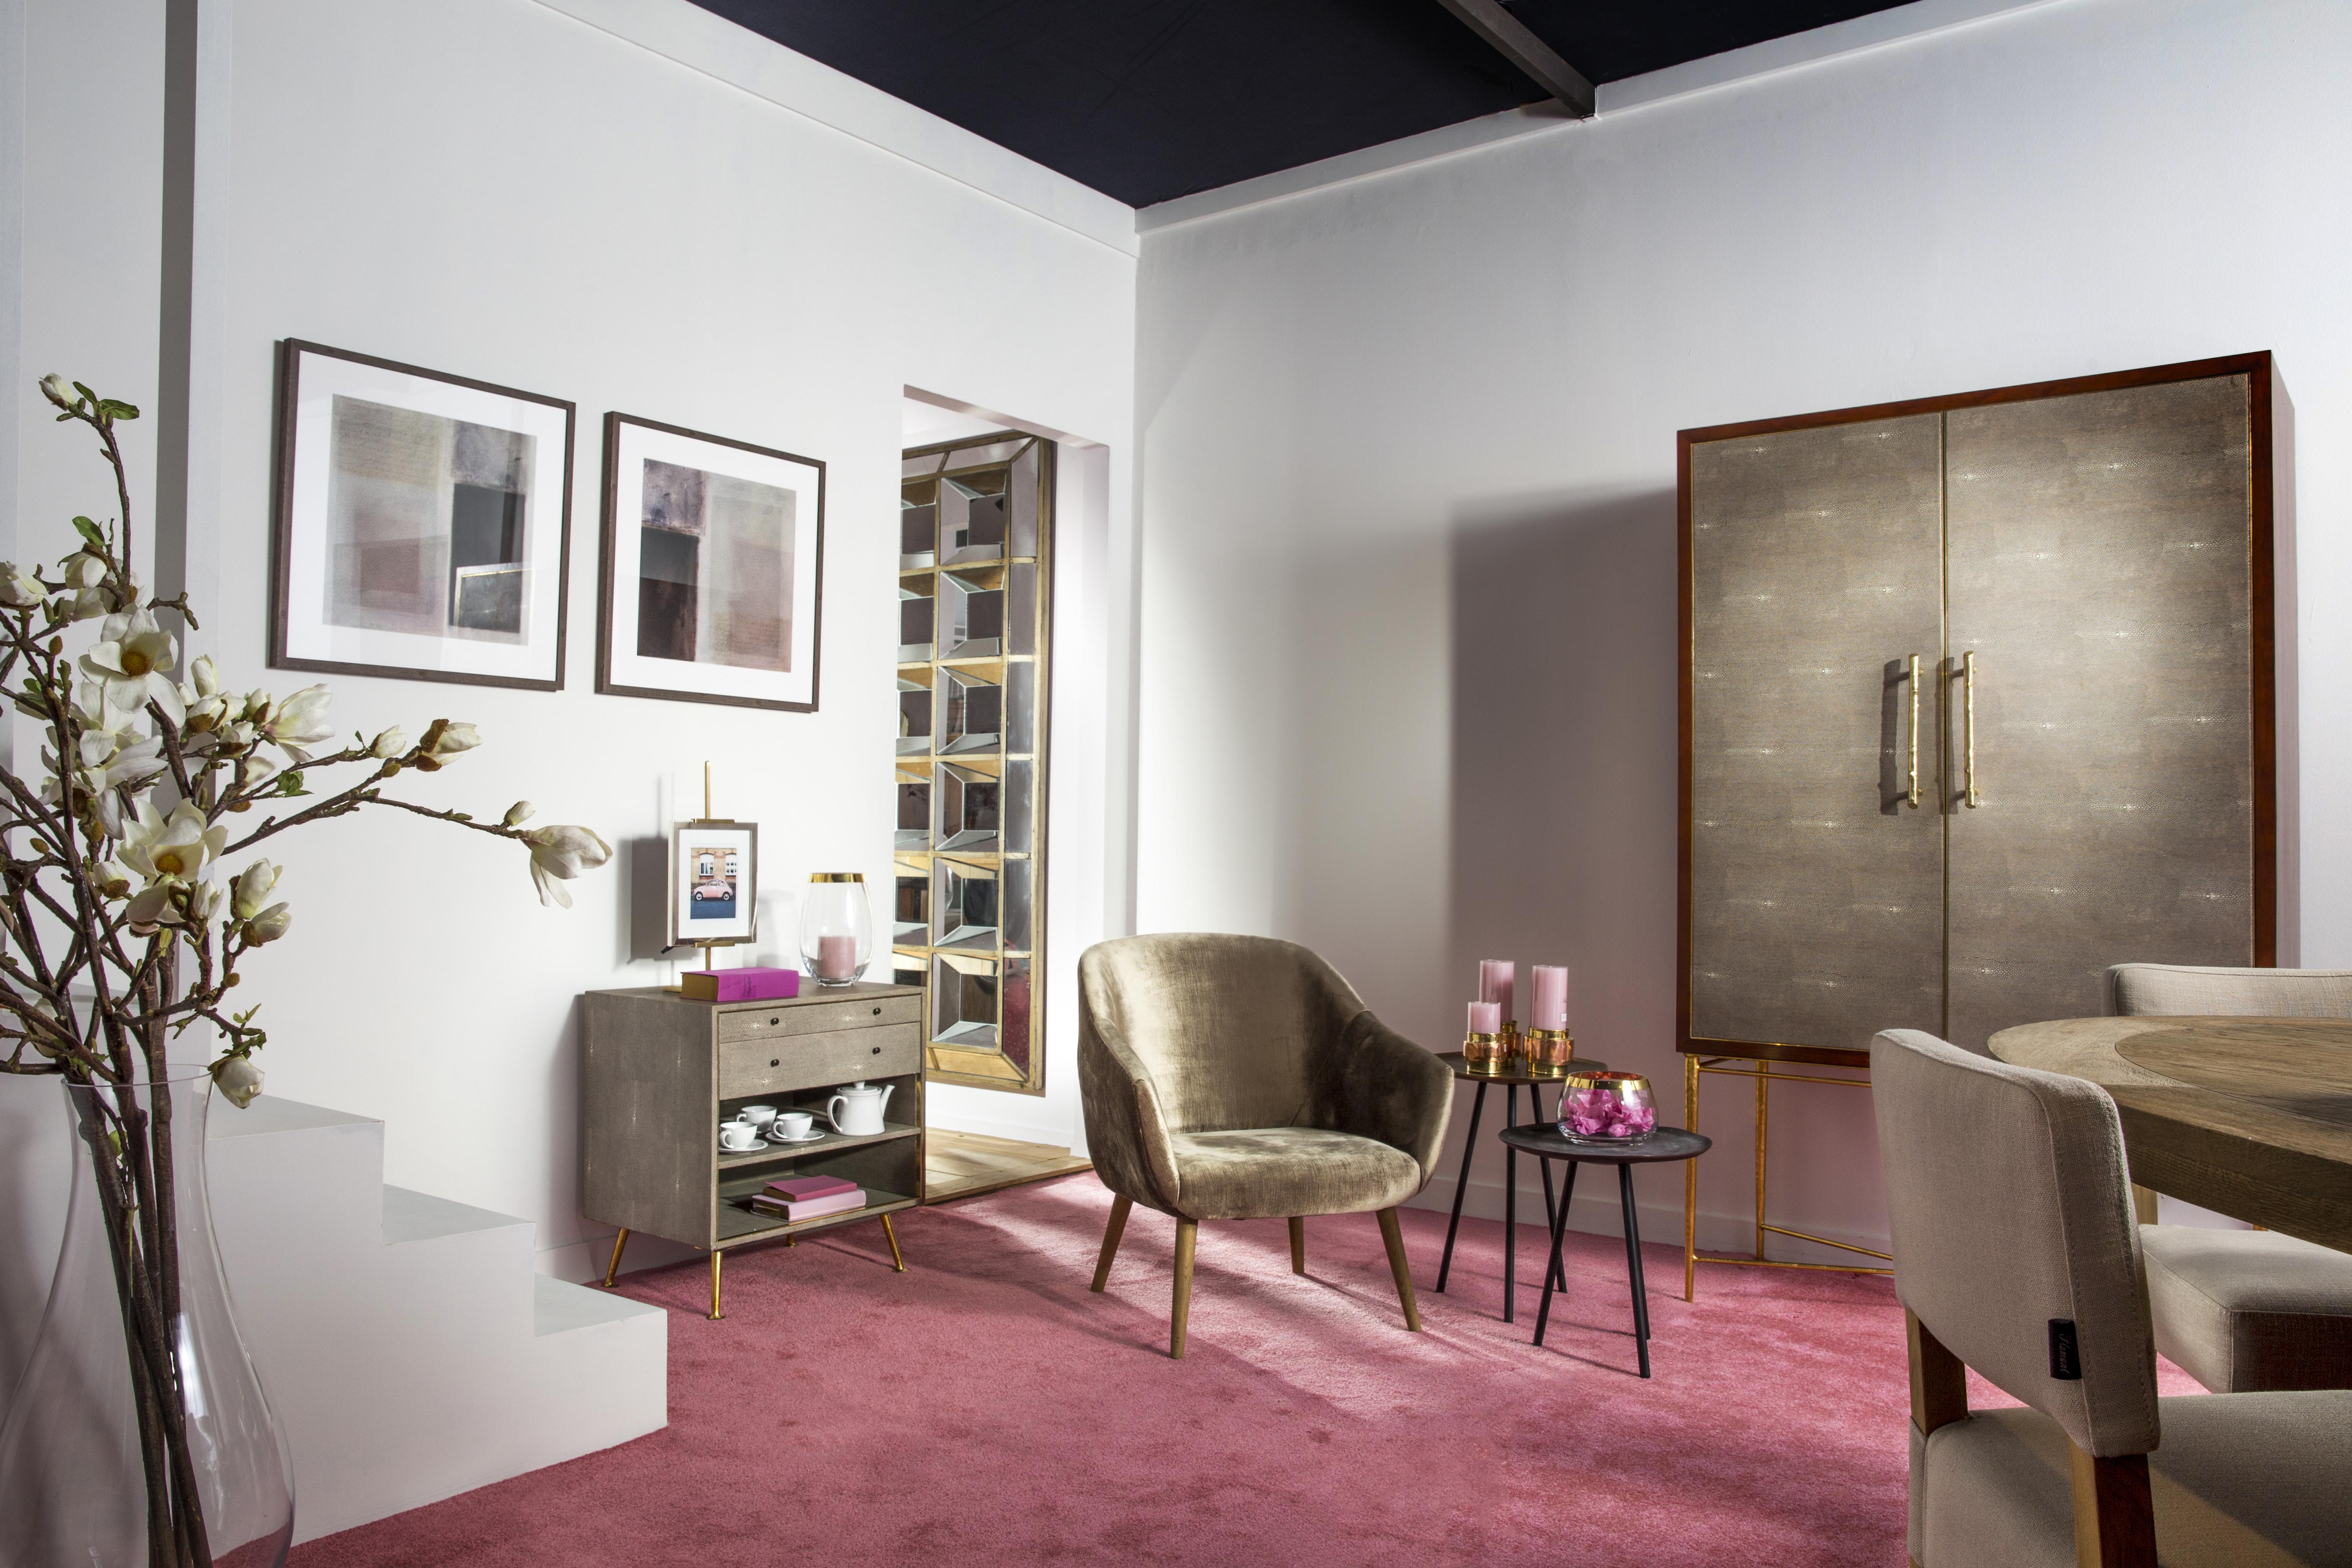 interiordesign chemnitz - Design 10